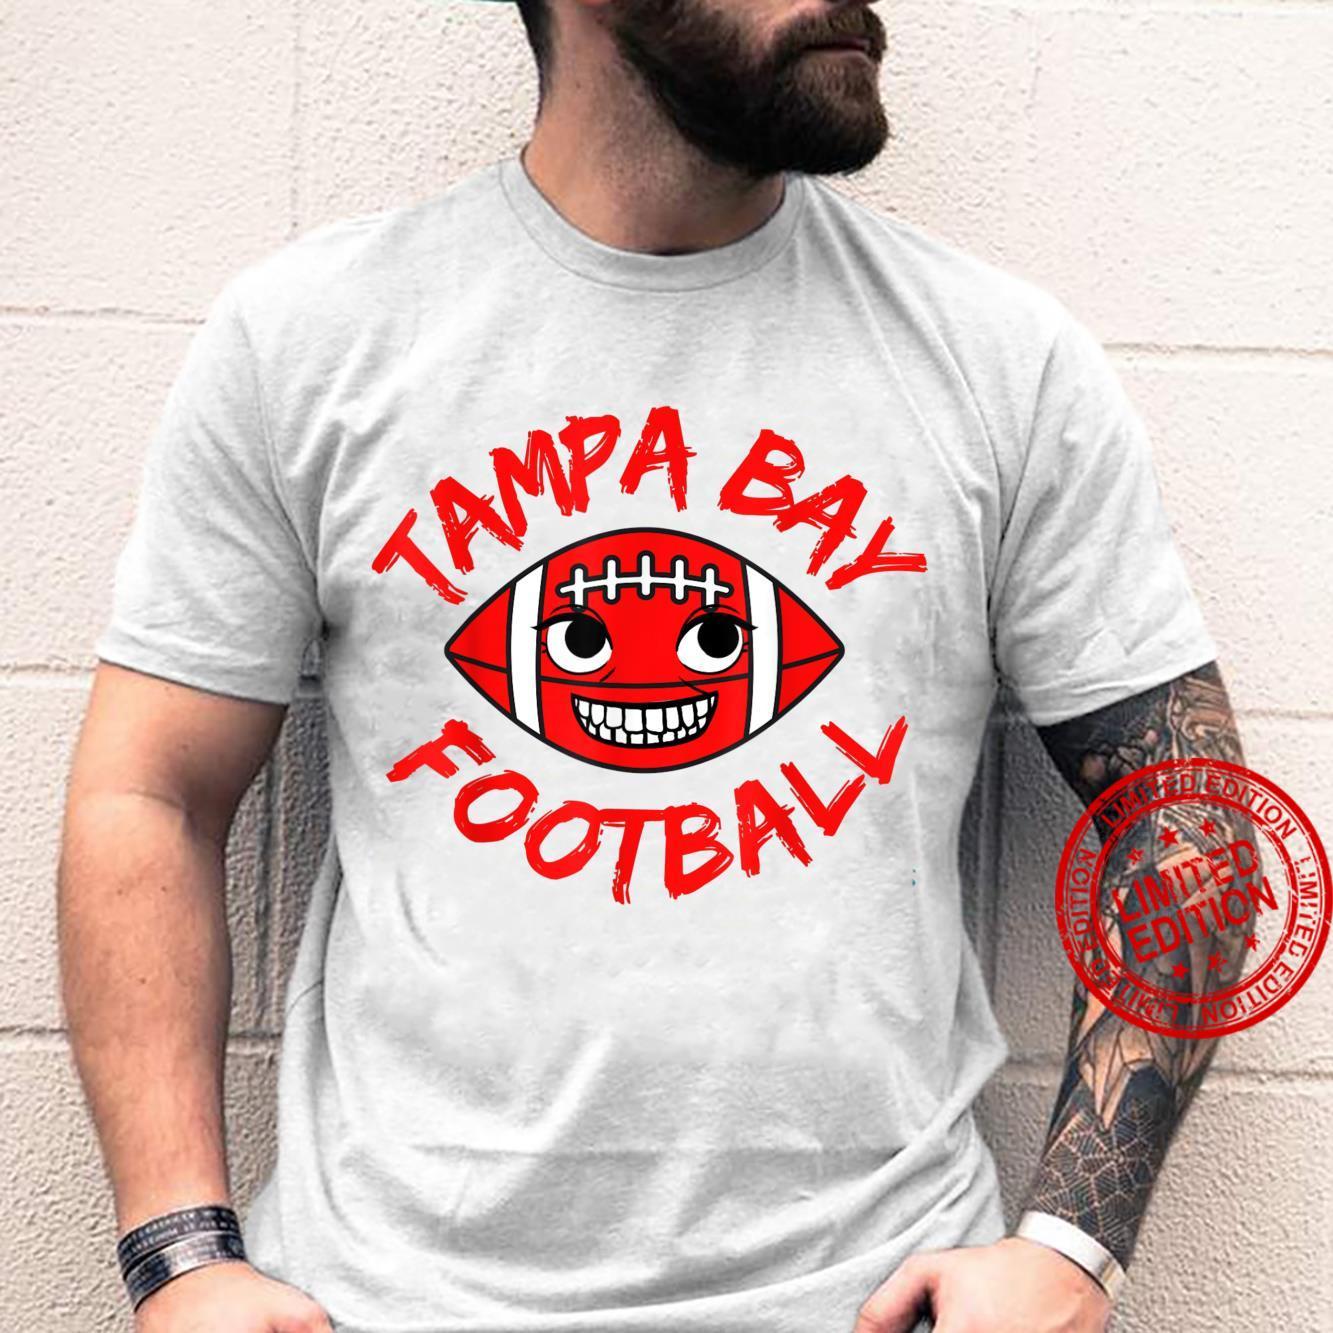 Tampa Bay Football matching Hometown Pride Shirt